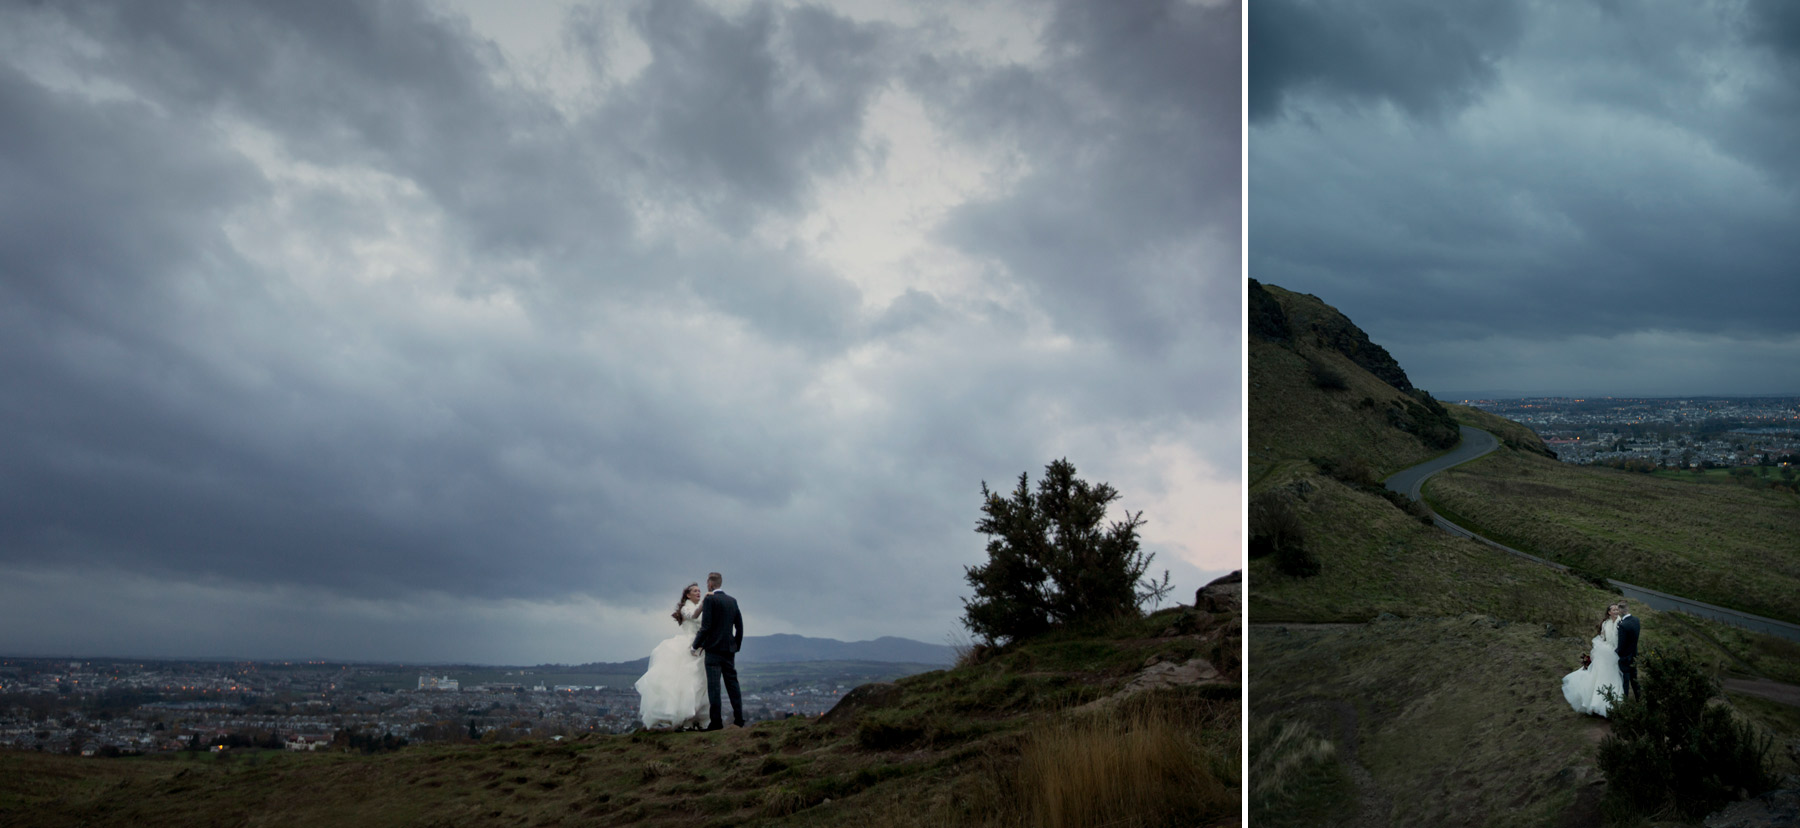 weddig portraits at twilight in scotland